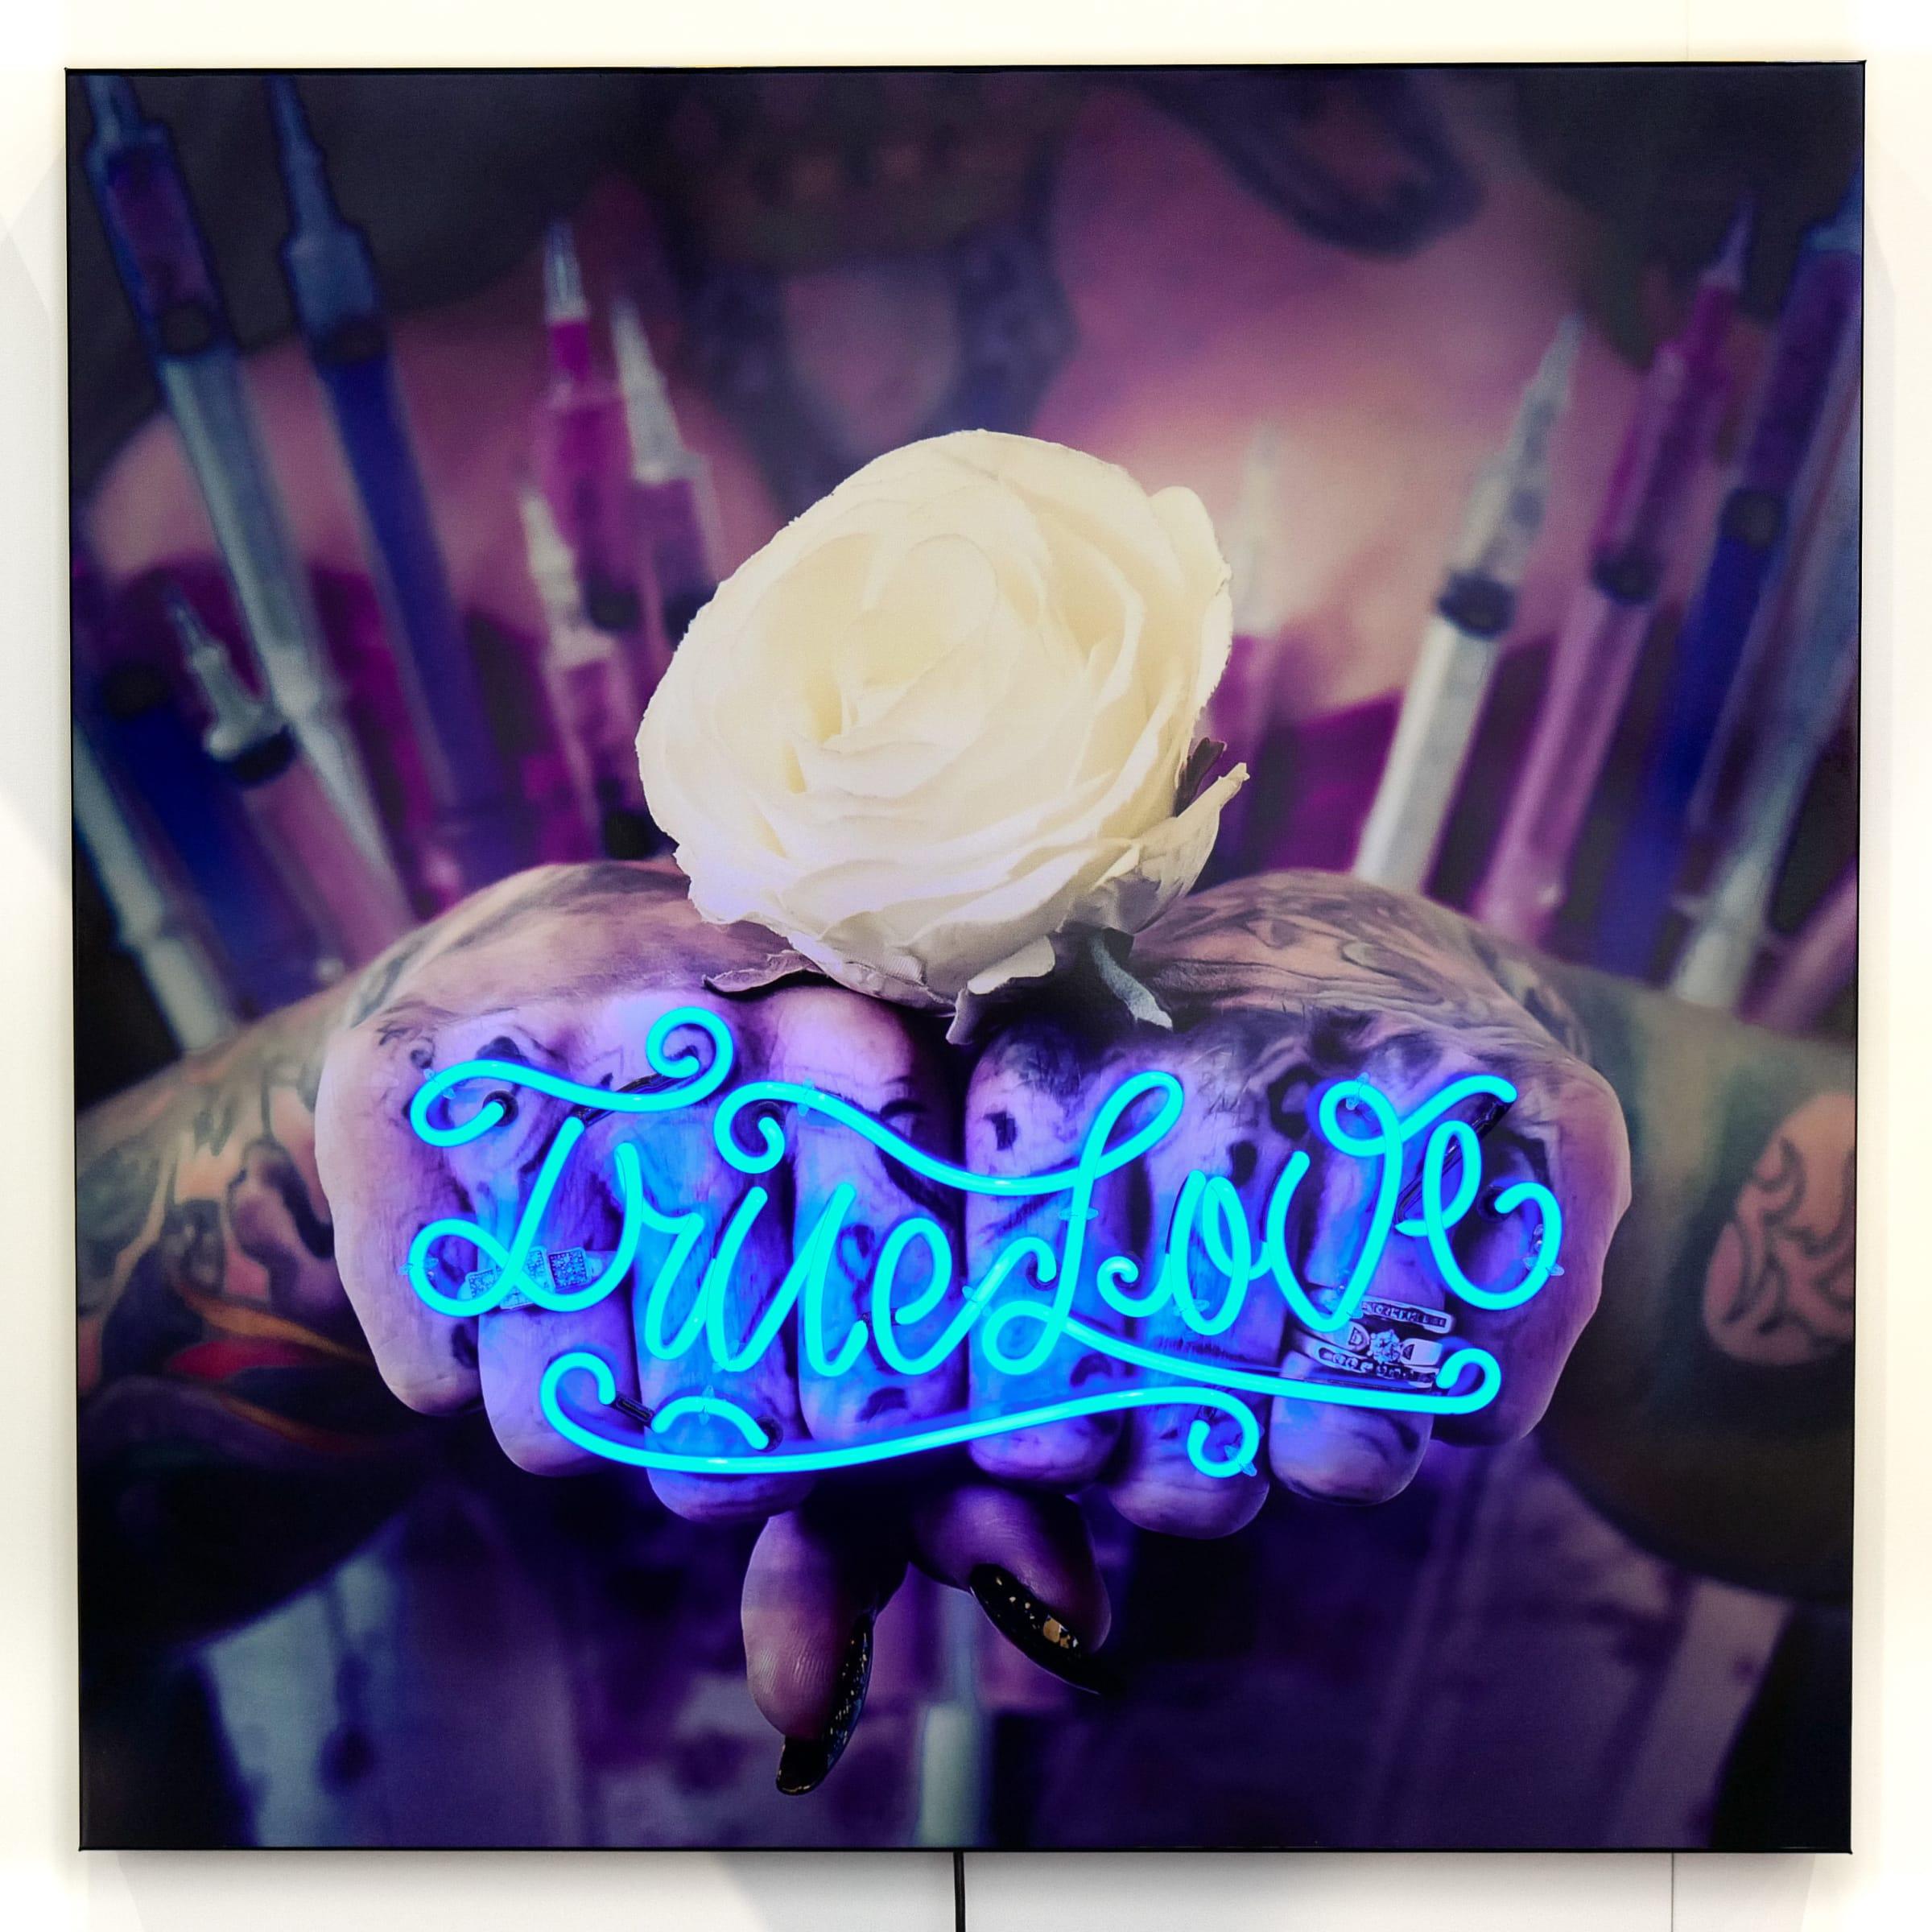 "<span class=""link fancybox-details-link""><a href=""/artists/61-stuart-robertson/works/6733-stuart-robertson-true-love-neon/"">View Detail Page</a></span><div class=""artist""><strong>Stuart Robertson</strong></div> <div class=""title""><em>True Love Neon</em></div> <div class=""medium"">Mixed media</div> <div class=""dimensions"">39.4 x 39.4 in<br />100 x 100 cm</div> <div class=""edition_details"">#1/11</div>"